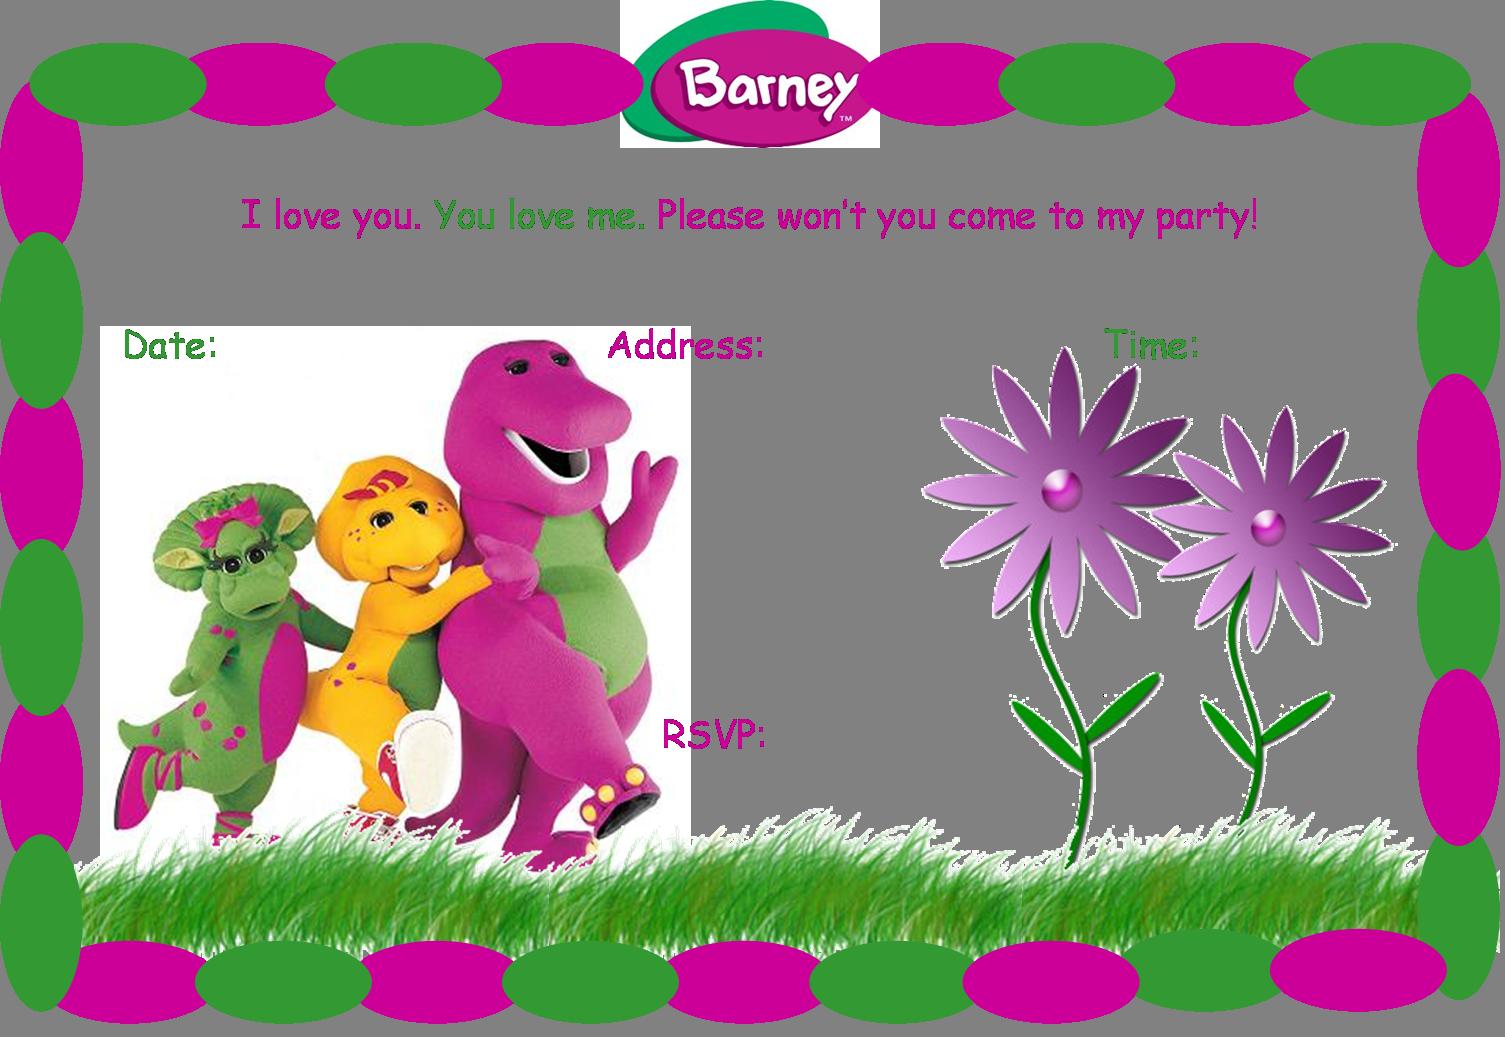 Creative Printables Home Barney Birthday Barney Party Barney Birthday Party